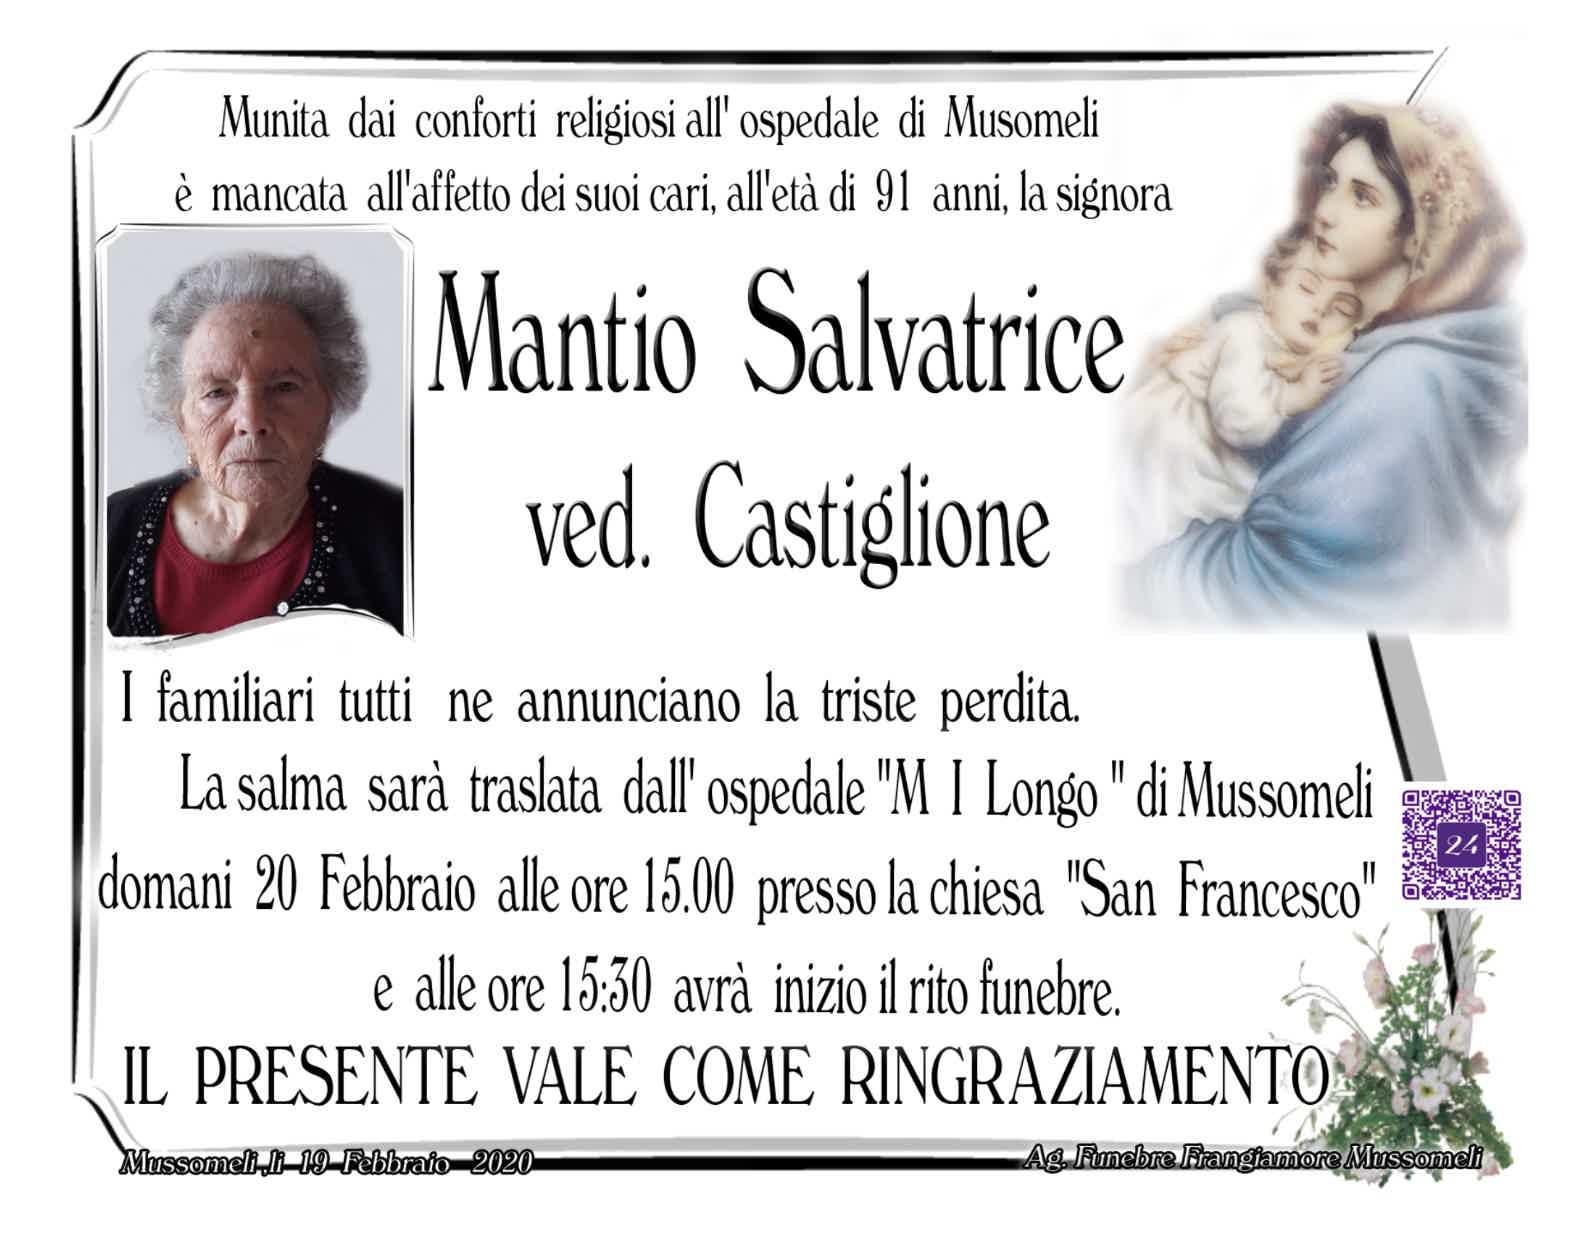 Salvatrice Mantio